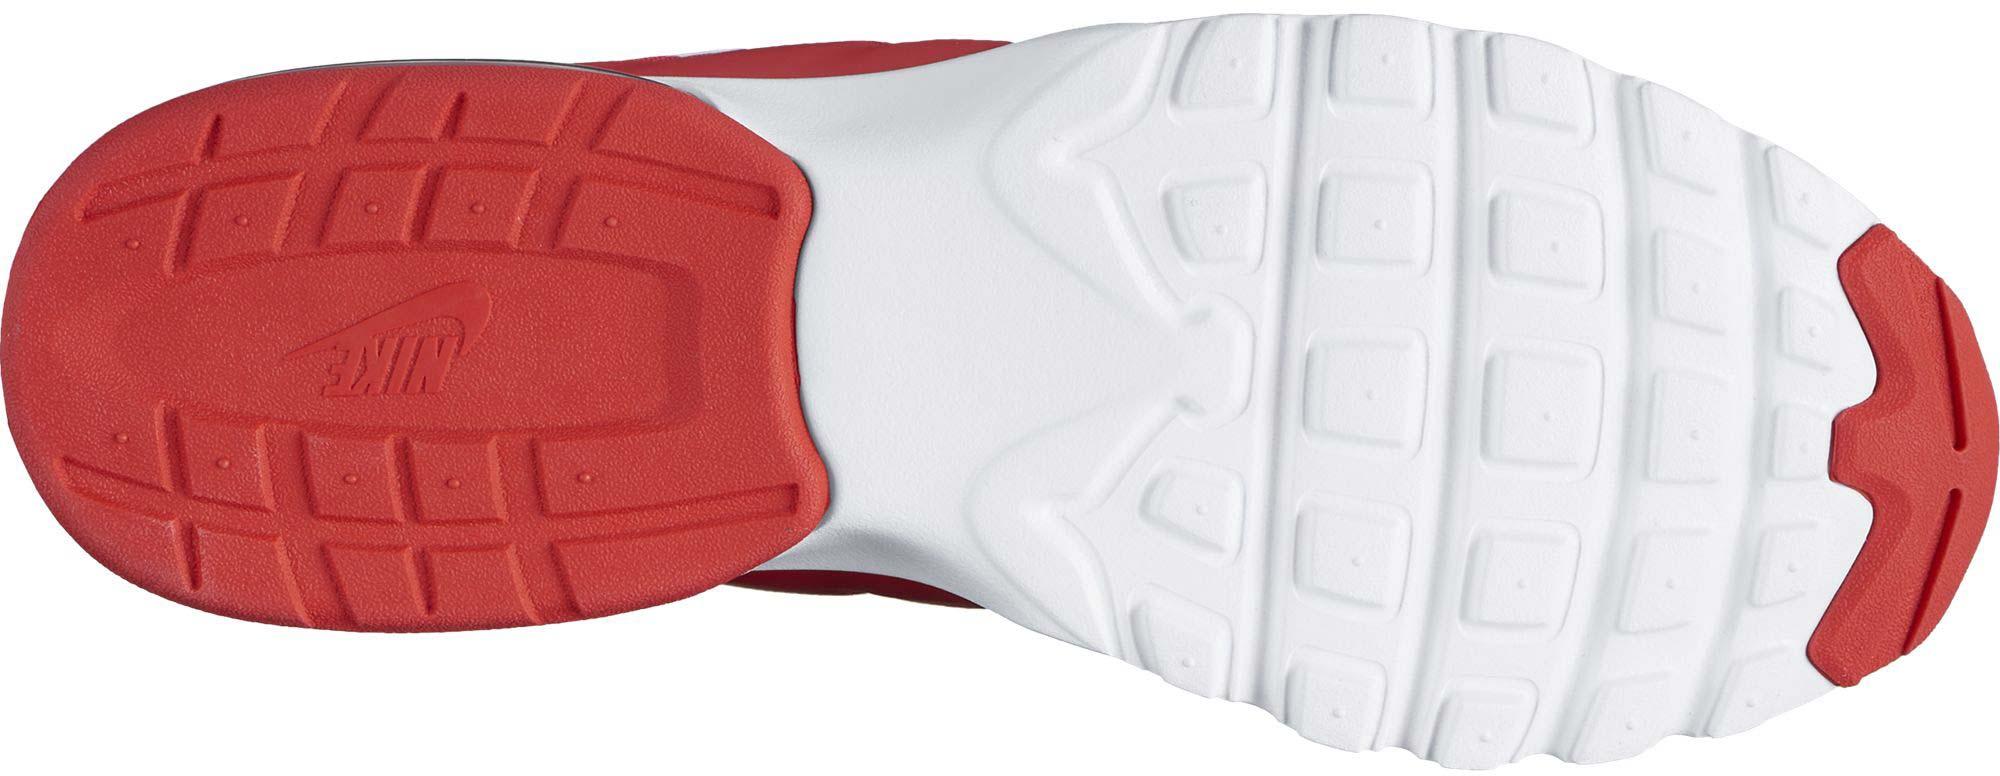 1ec4cace130 Nike AIR MAX INVIGOR PRINT SHOE. Pánská volnočasová obuv. Pánská  volnočasová obuv